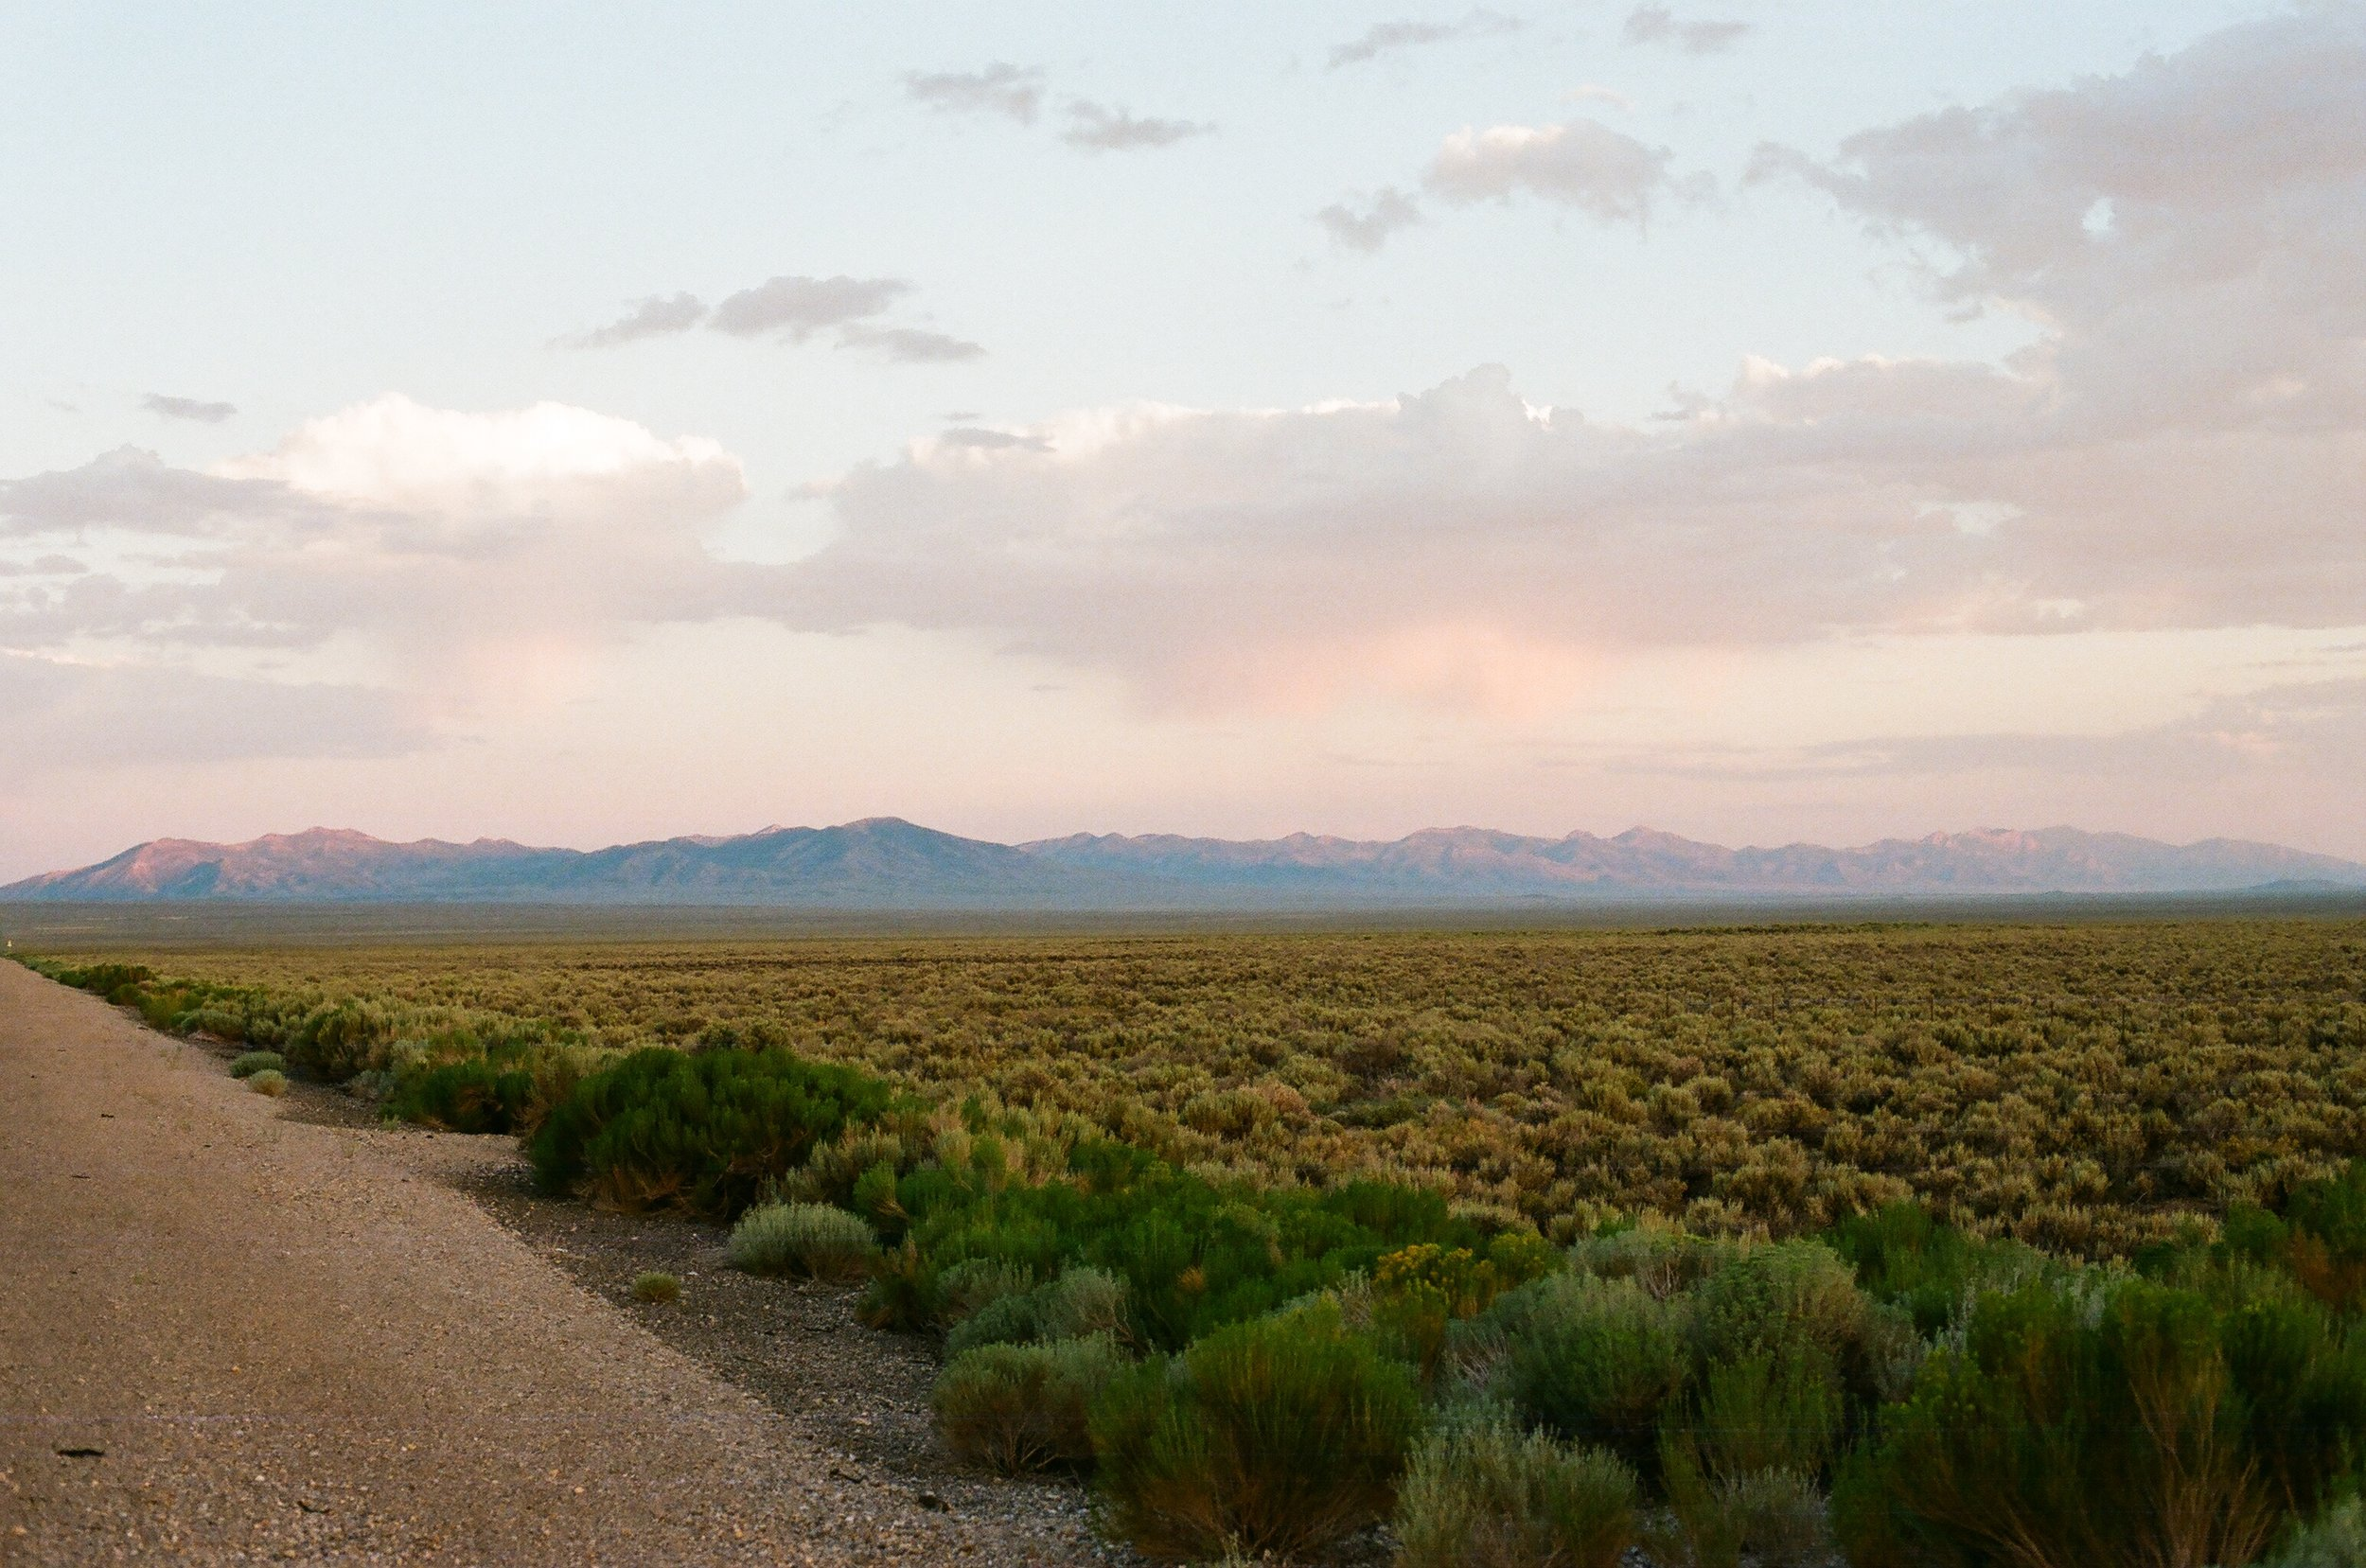 DesertRoadVista.jpg